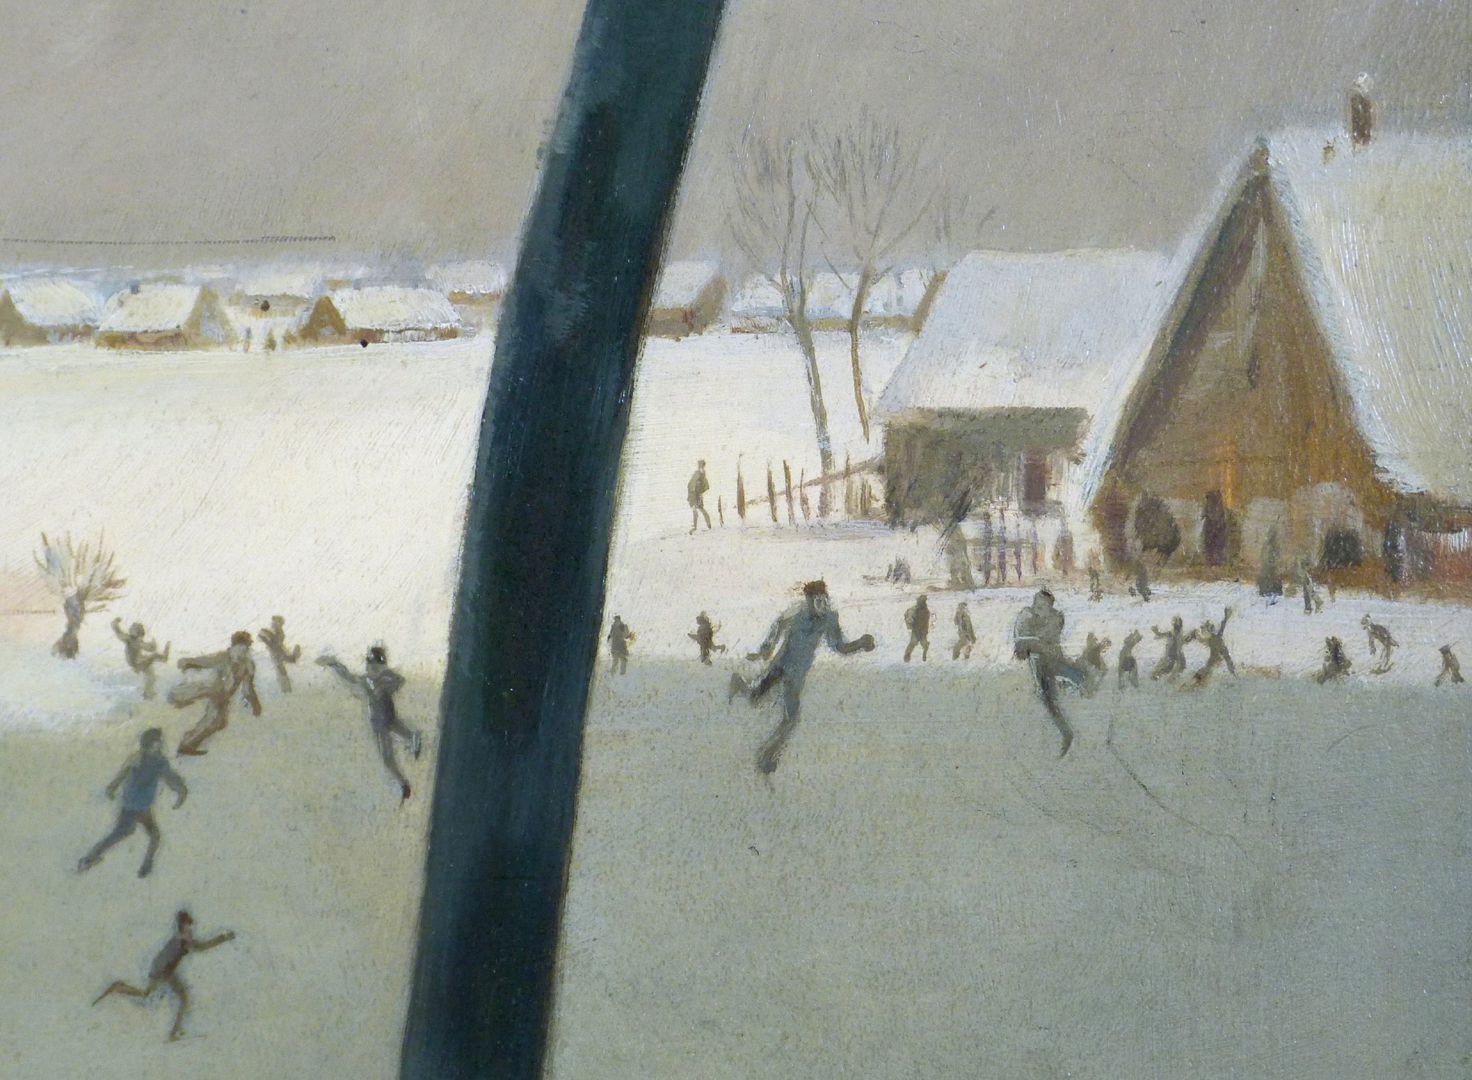 Winter in Knoblauchsland near Nuremberg Detail with skaters